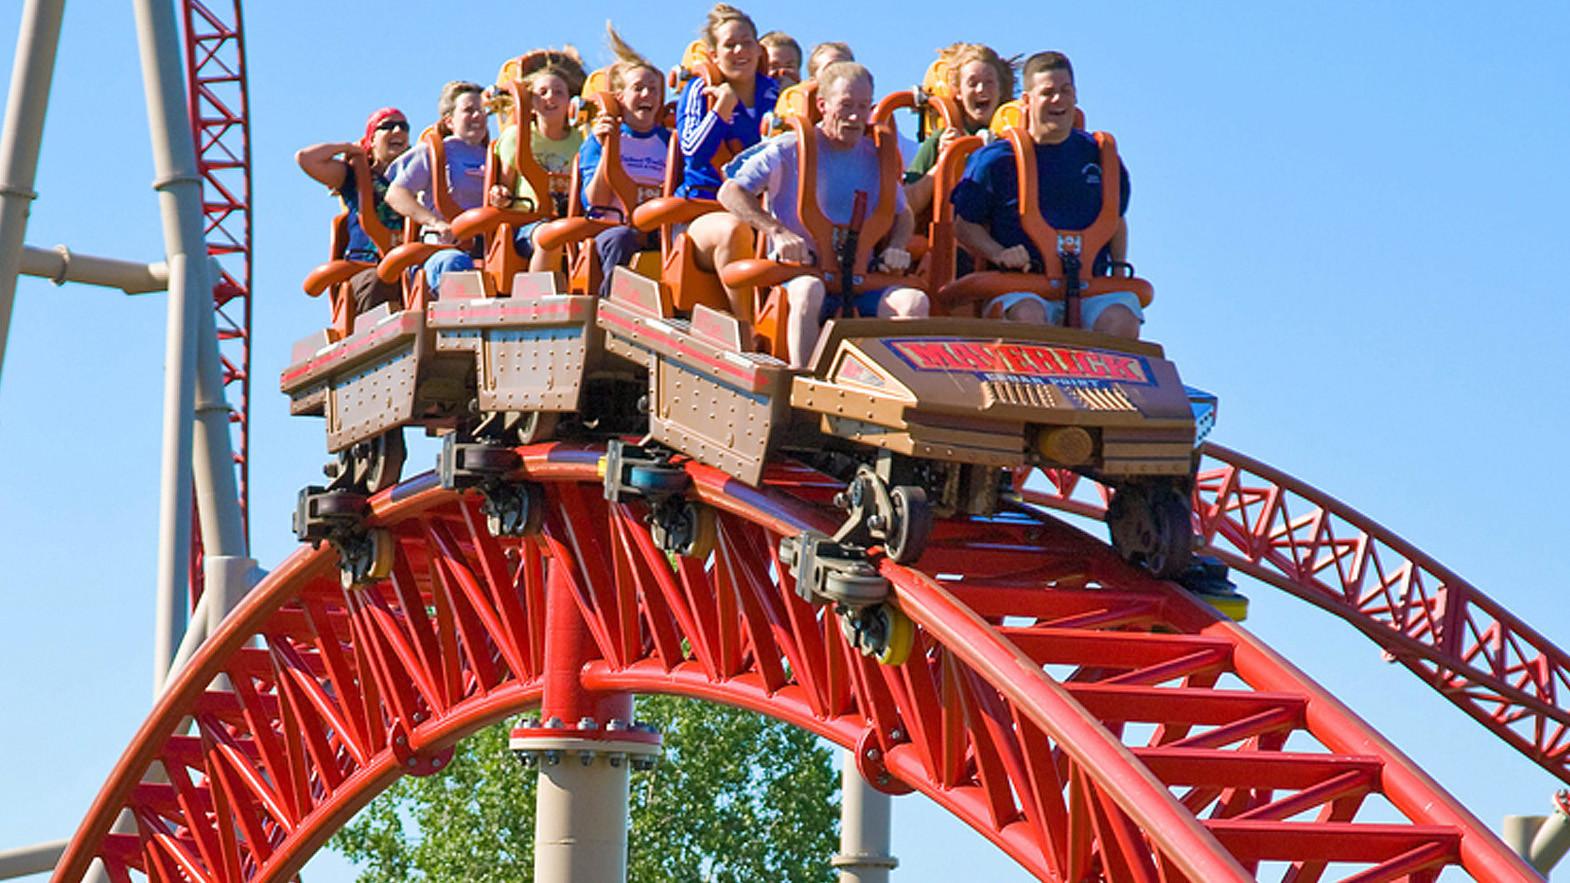 The Maverick multi-launch coaster at Ohio's Cedar Point.